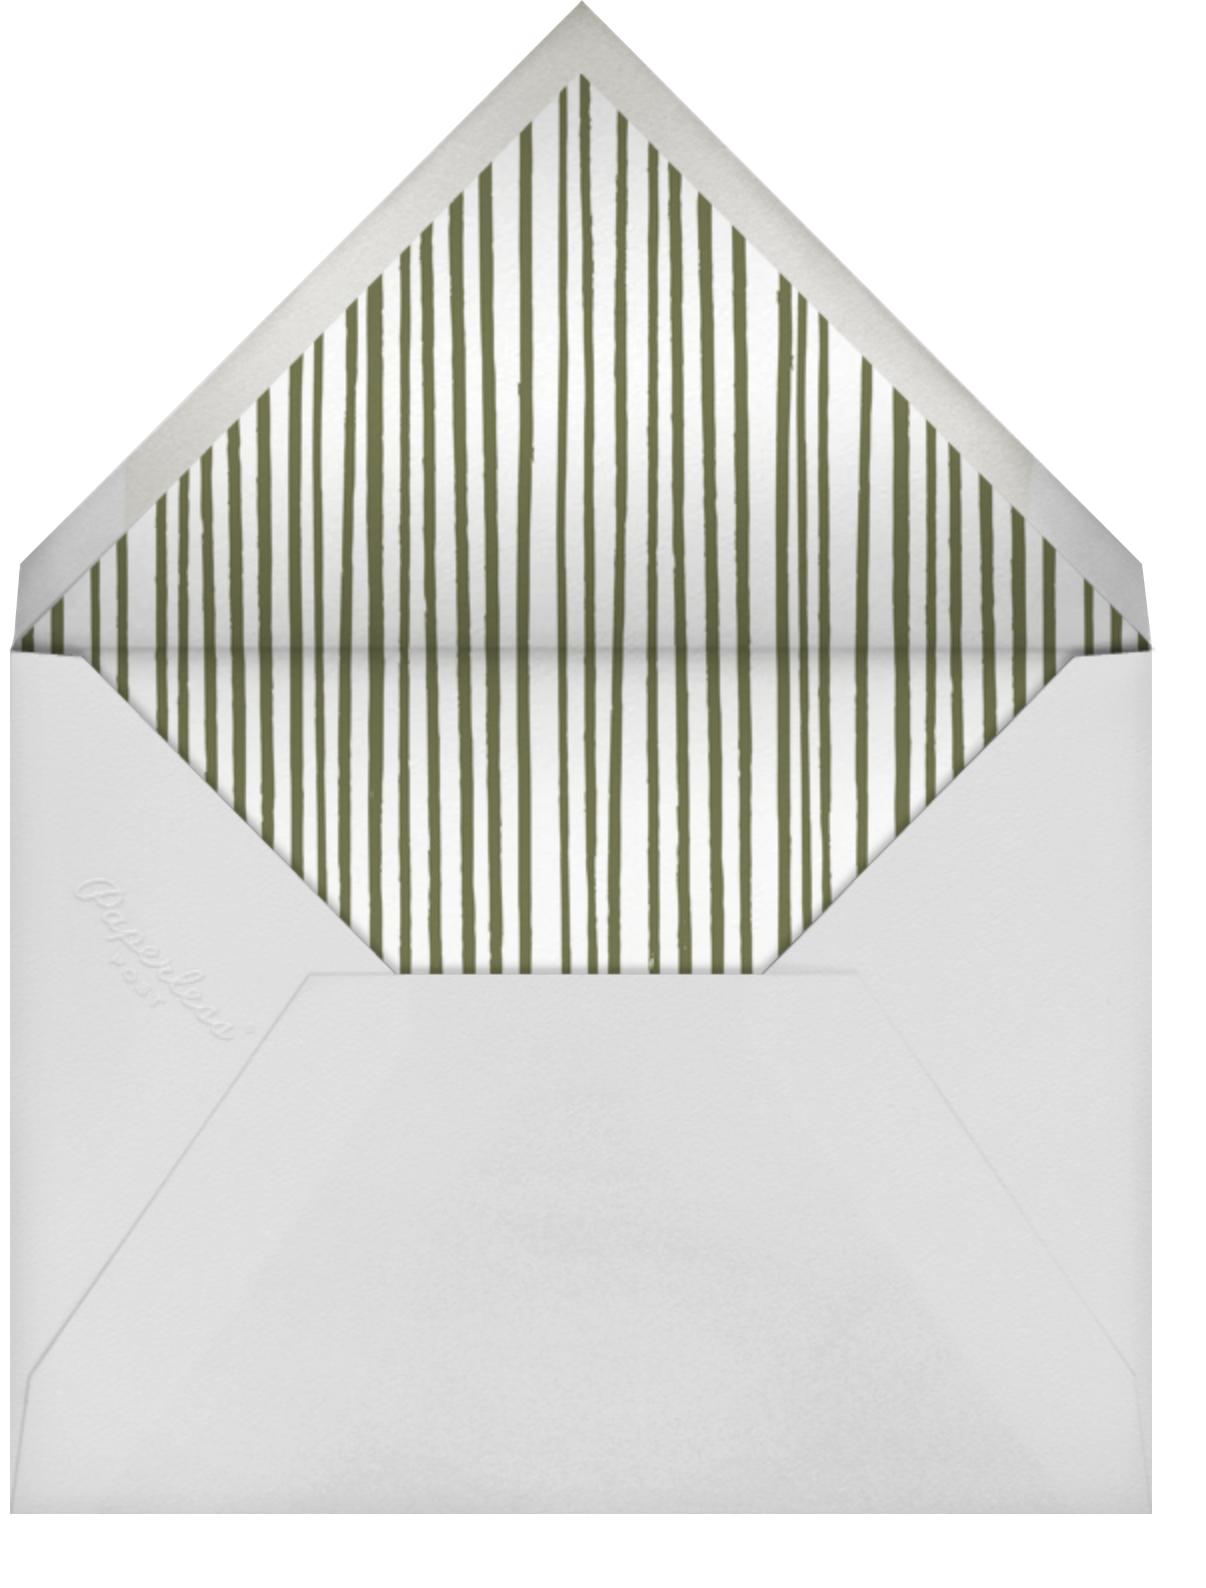 Poppies - Crimson - Paperless Post - Envelope